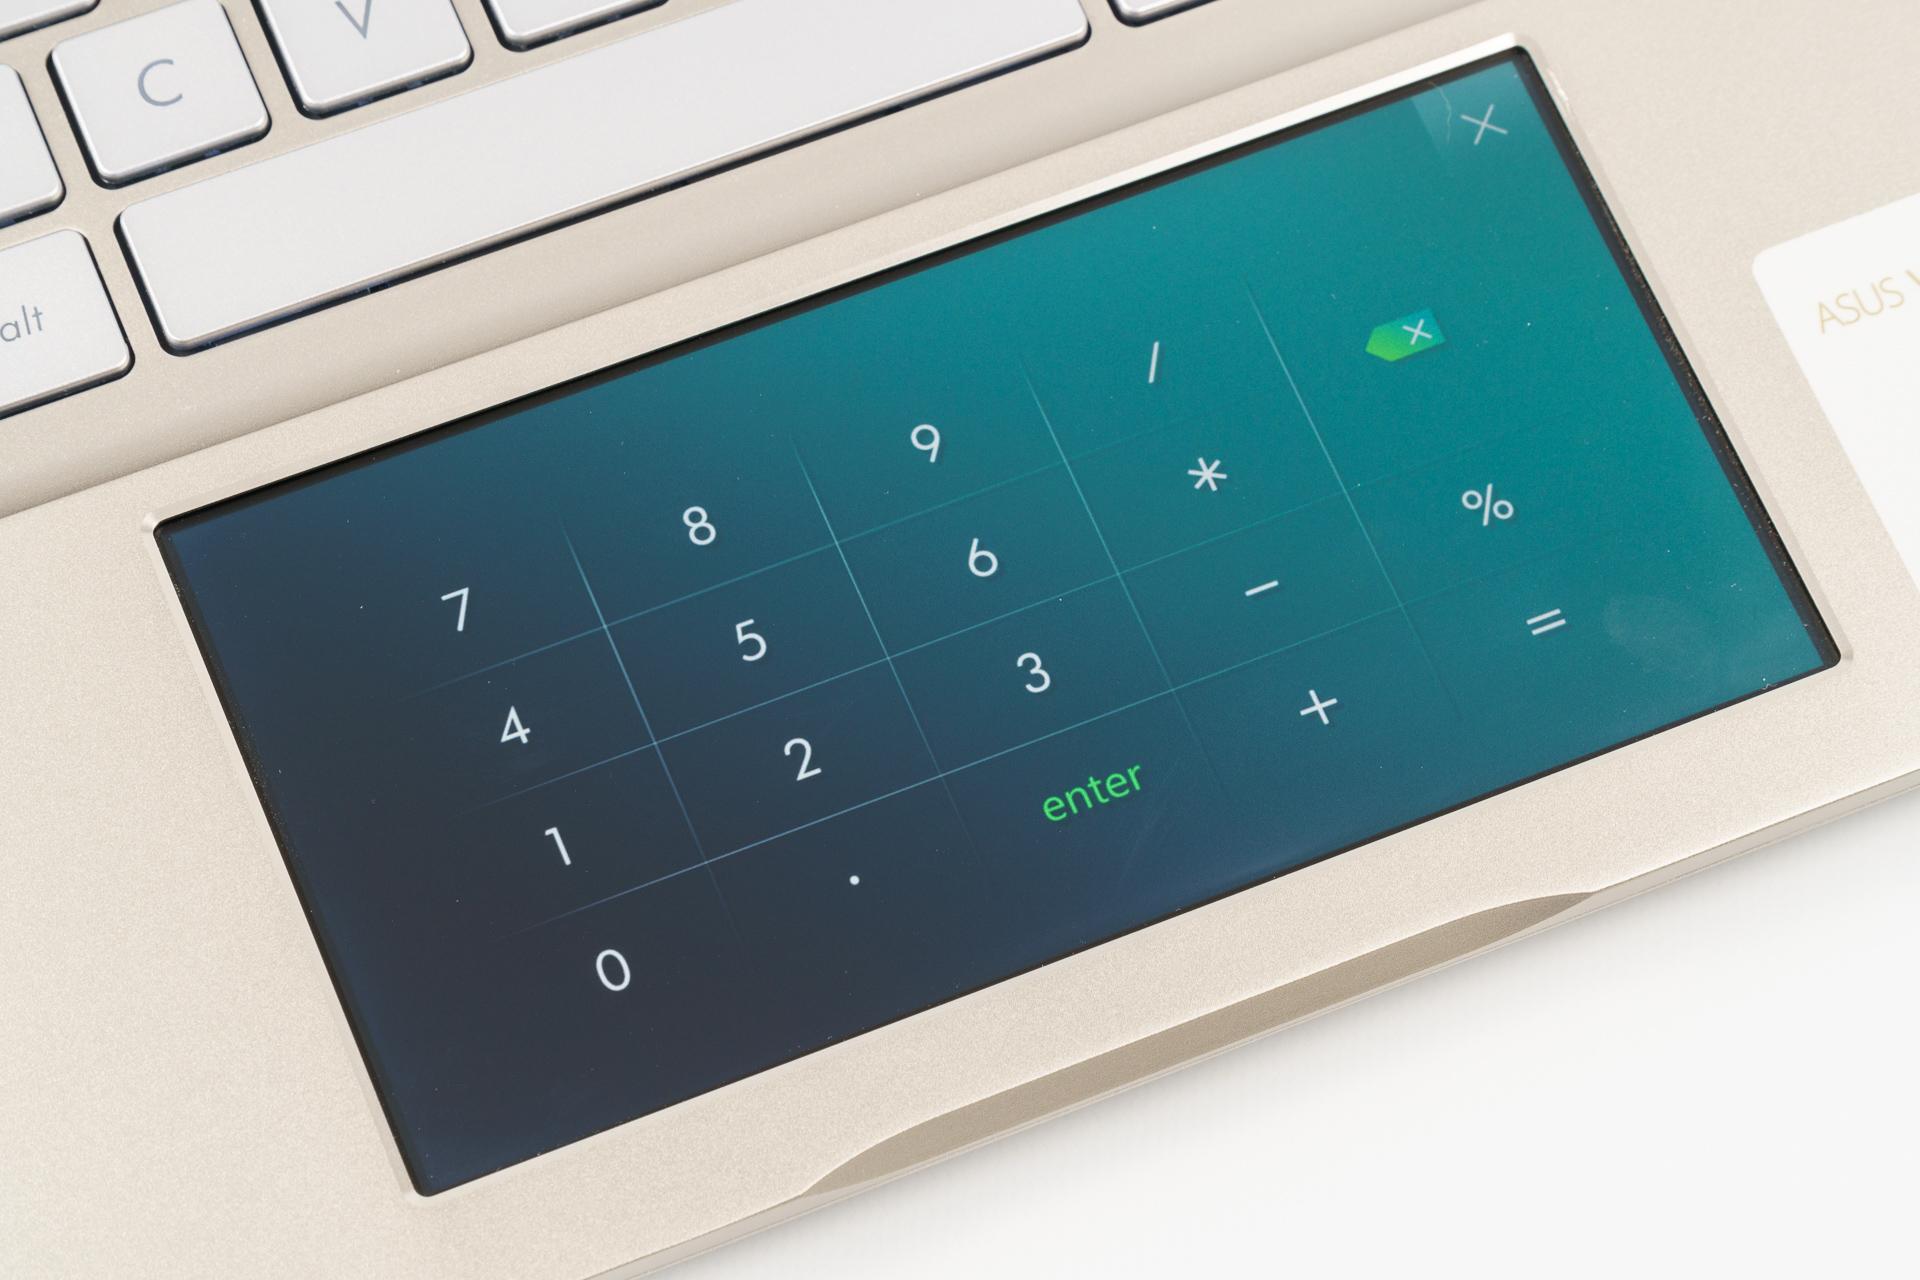 Asus VivoBook ze ScreenPadem, czyli po co w notebooku drugi ekran? 18